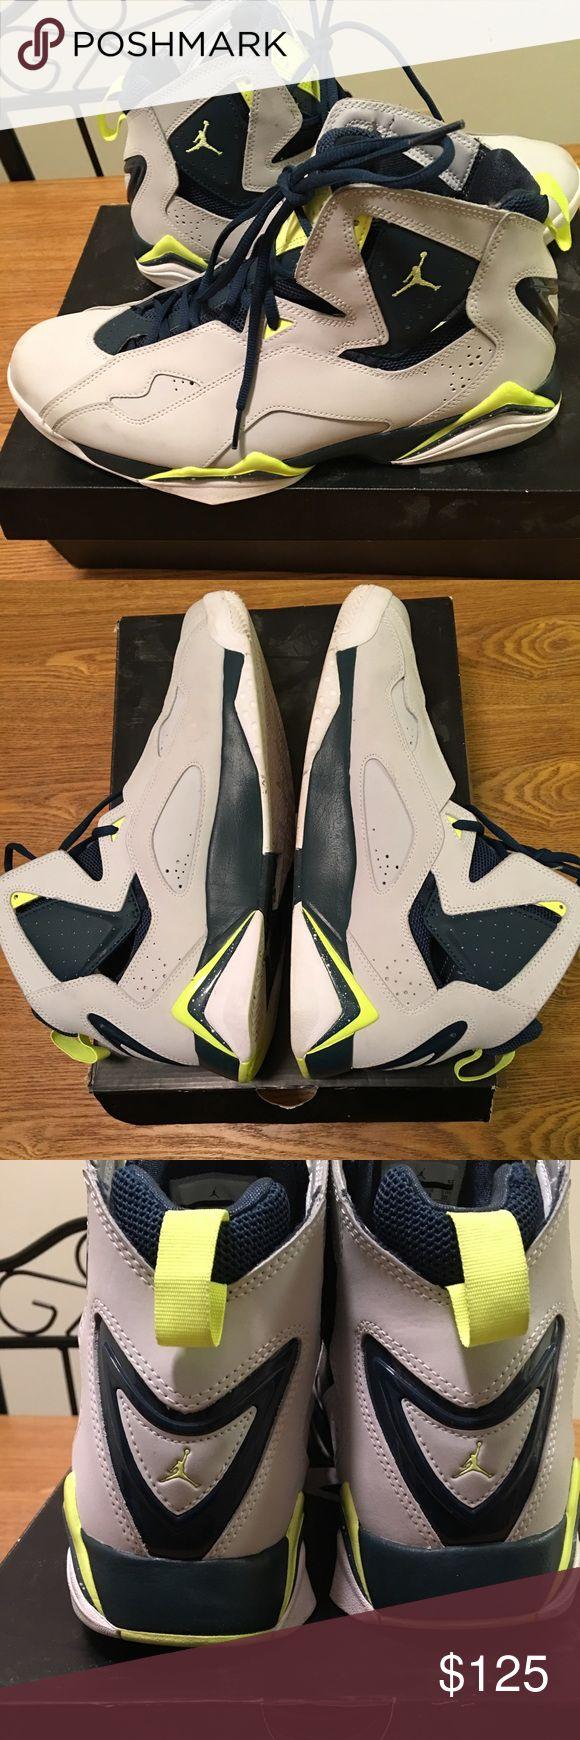 Jordan true flight Comes with original box. Shoes are still in excellent condition. Jordan Shoes Athletic Shoes